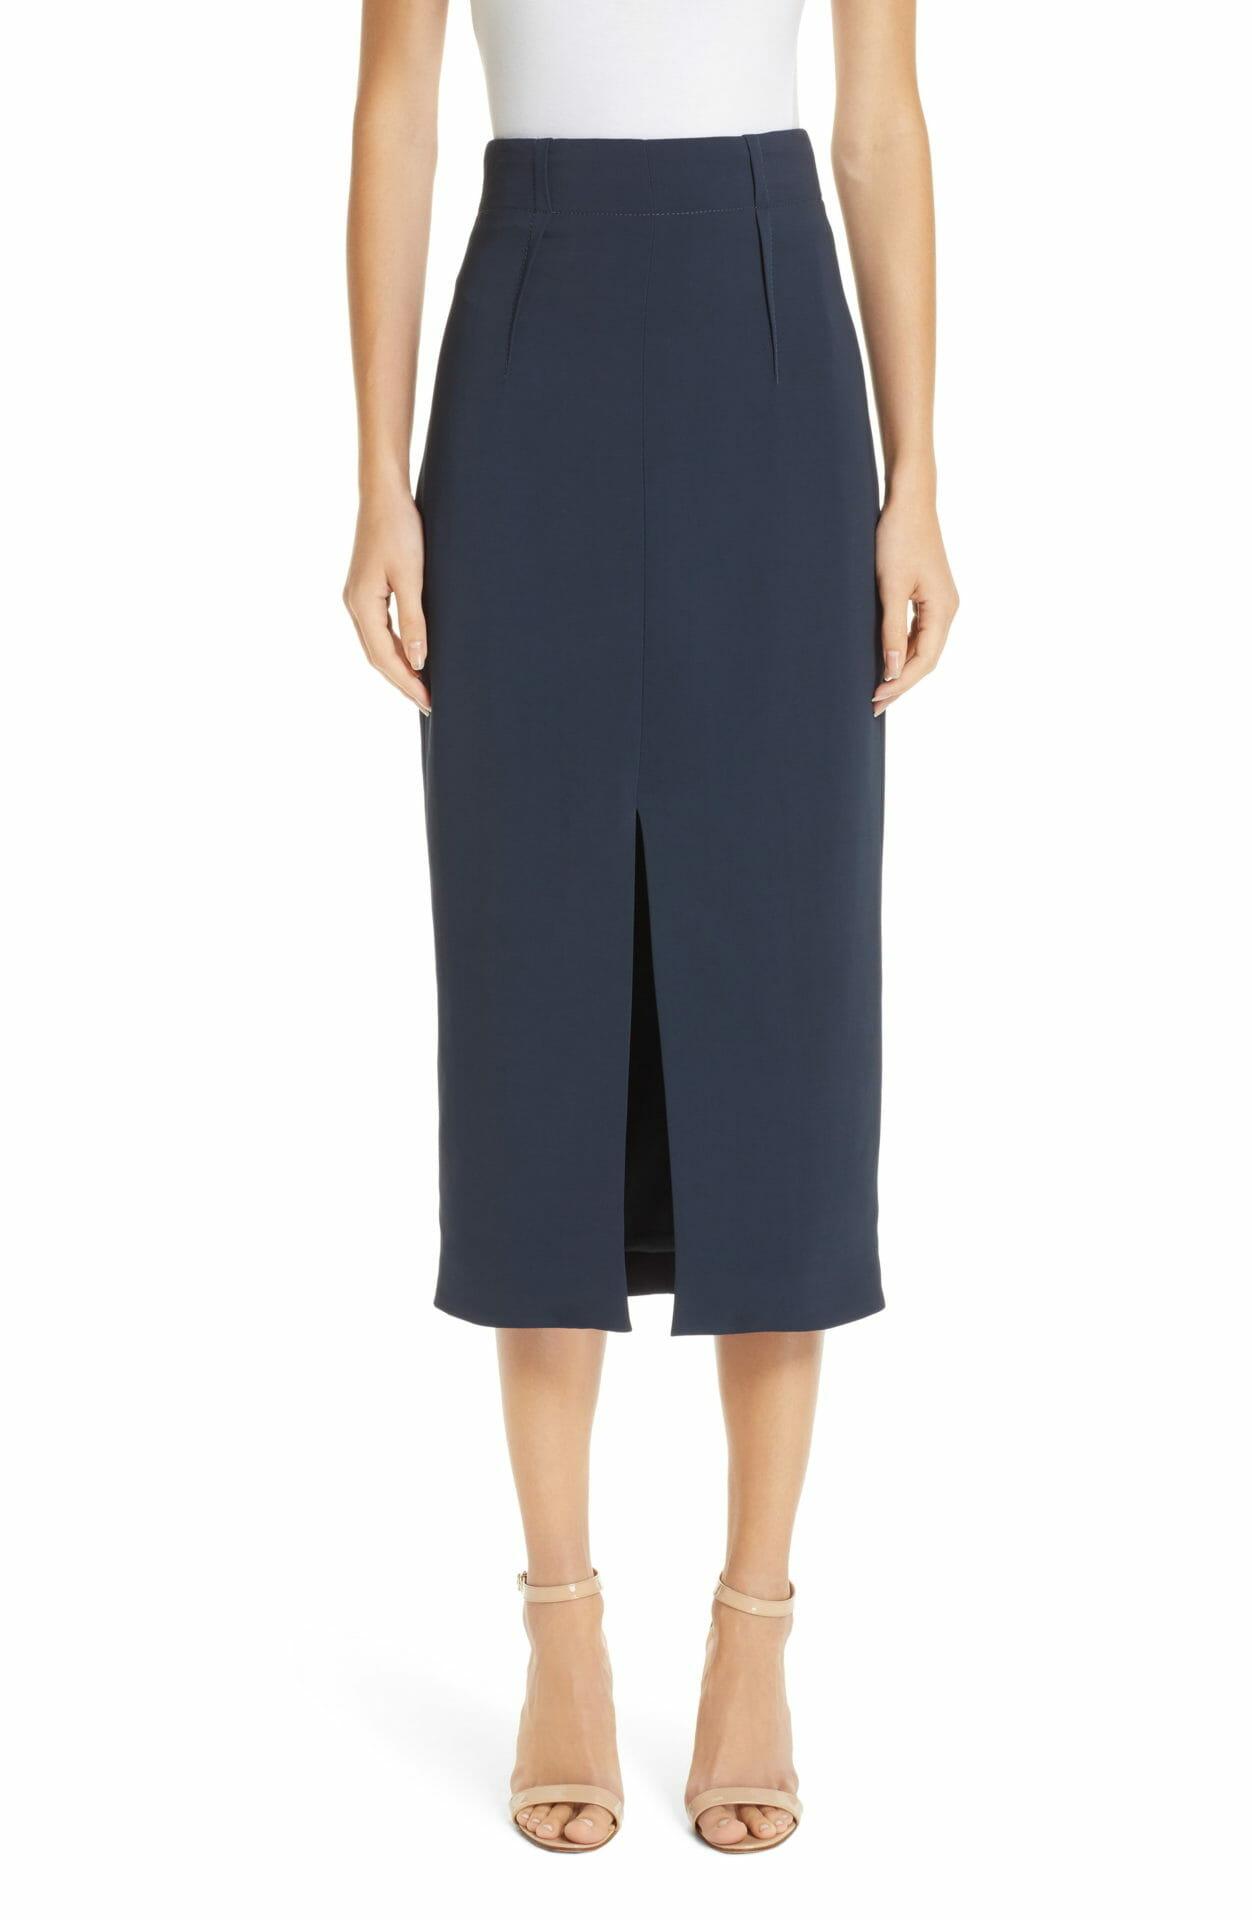 CUSHNIE Slit Pencil Skirt, Main, color, STORM